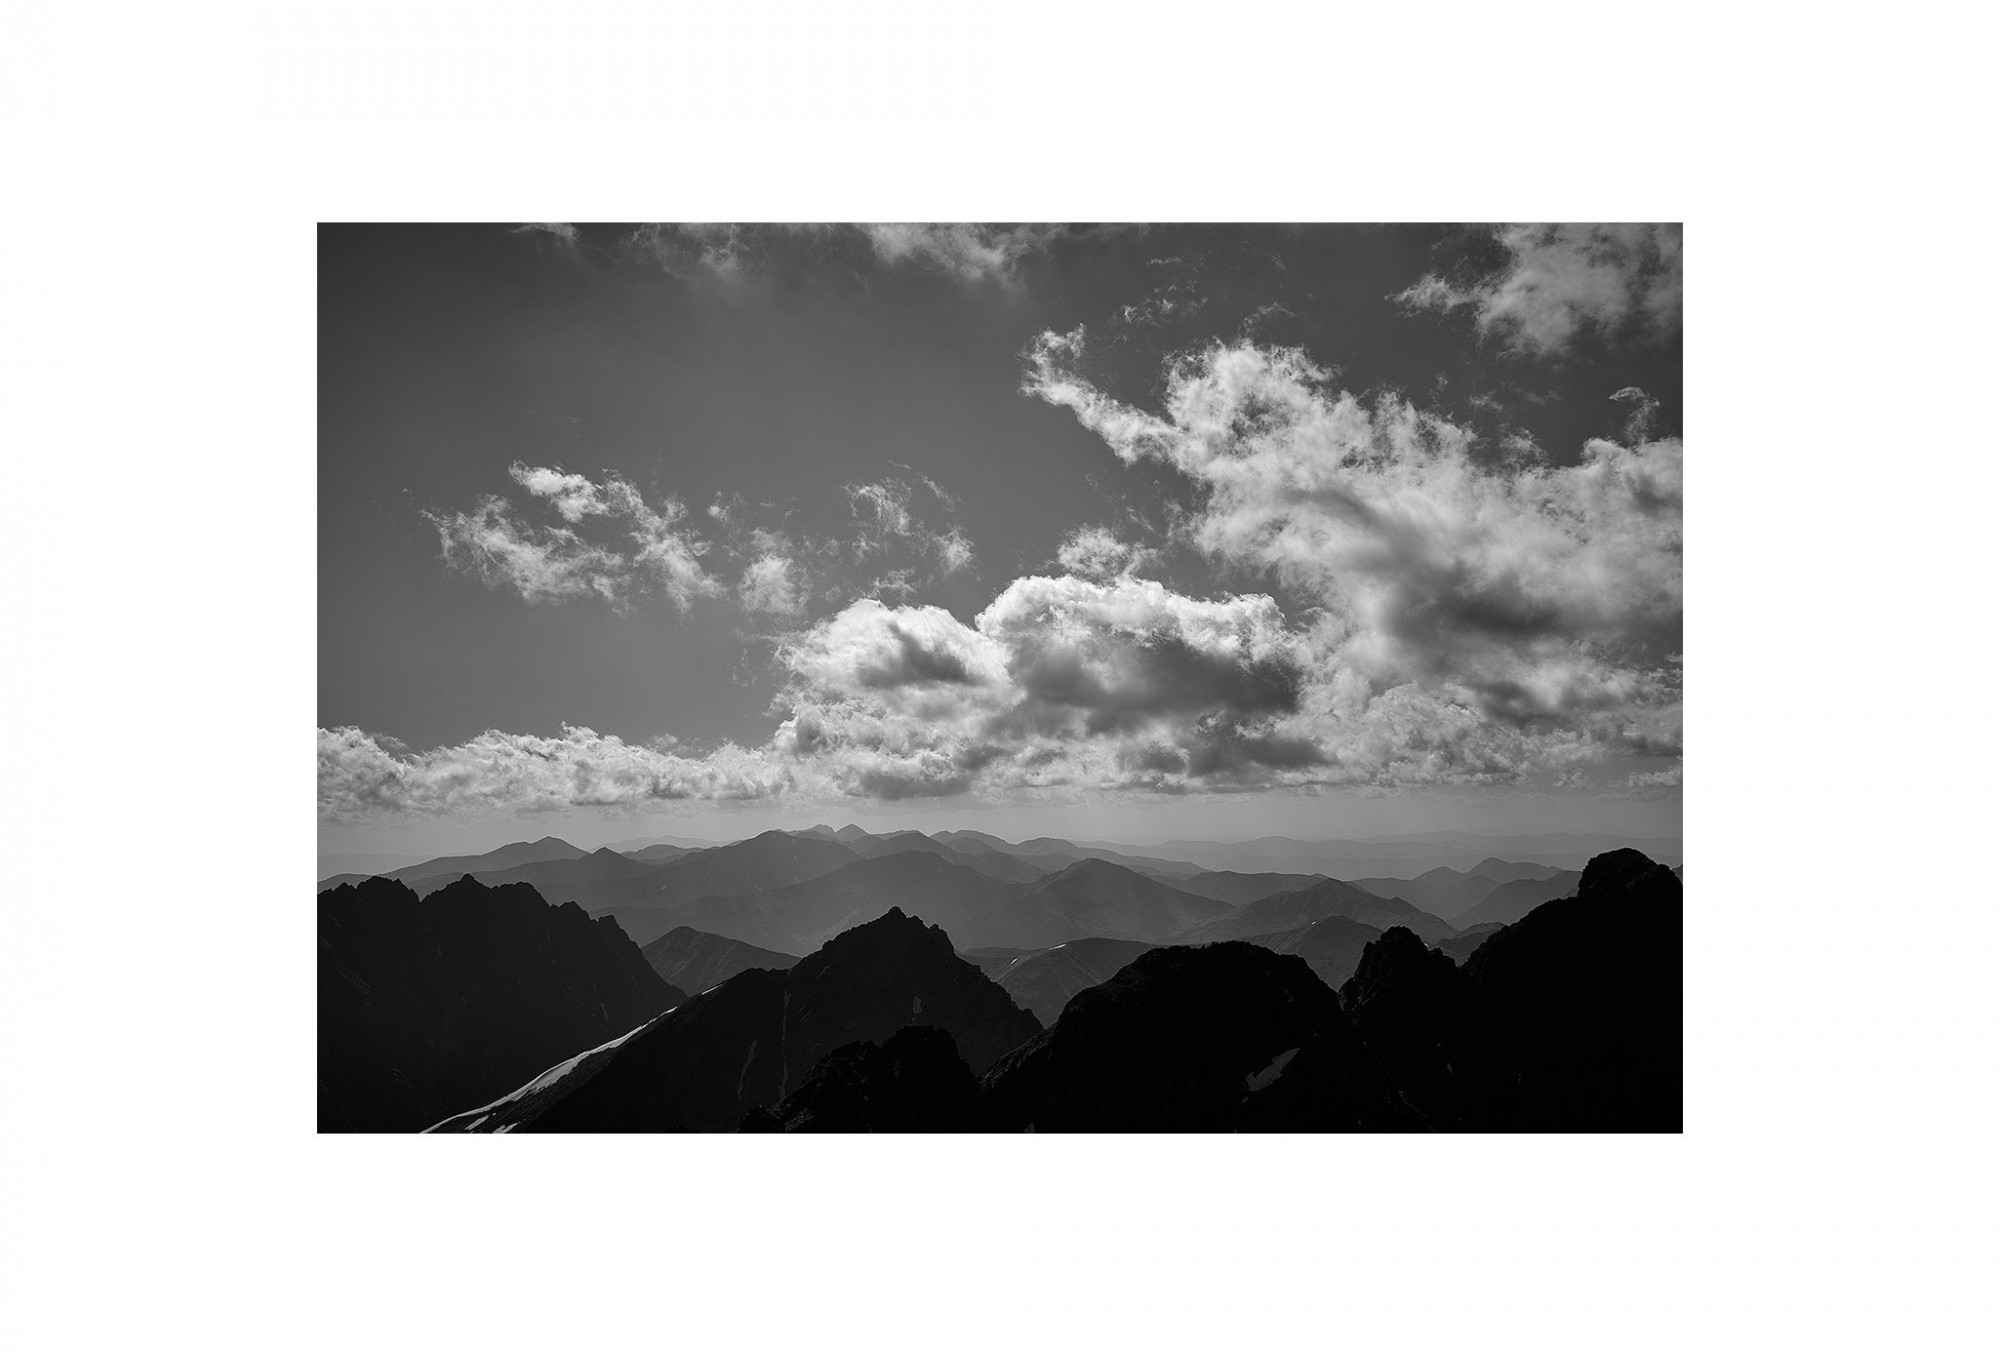 Afbeelding: Landscape high Tatras mountains Poland, foto Van Huffel, foto kunst zwart wit, landschapsfotografie.